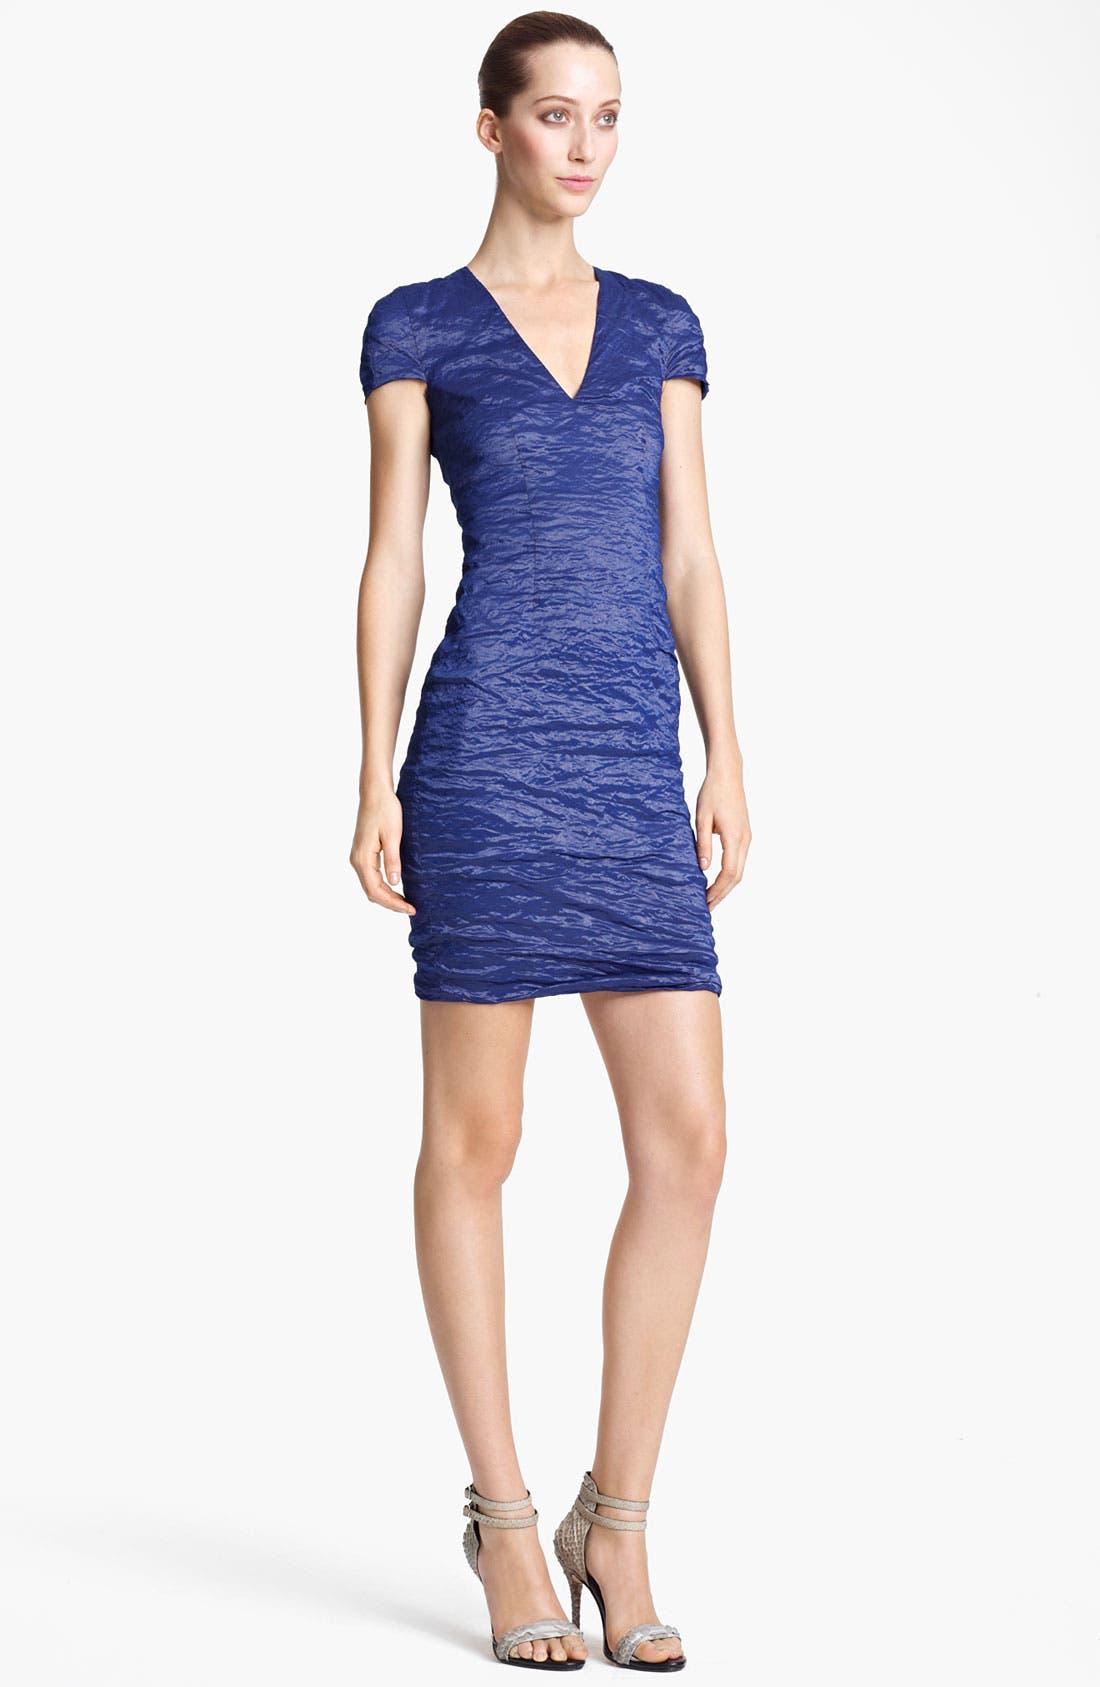 Alternate Image 1 Selected - Yigal Azrouël Stretch Metallic Taffeta Dress